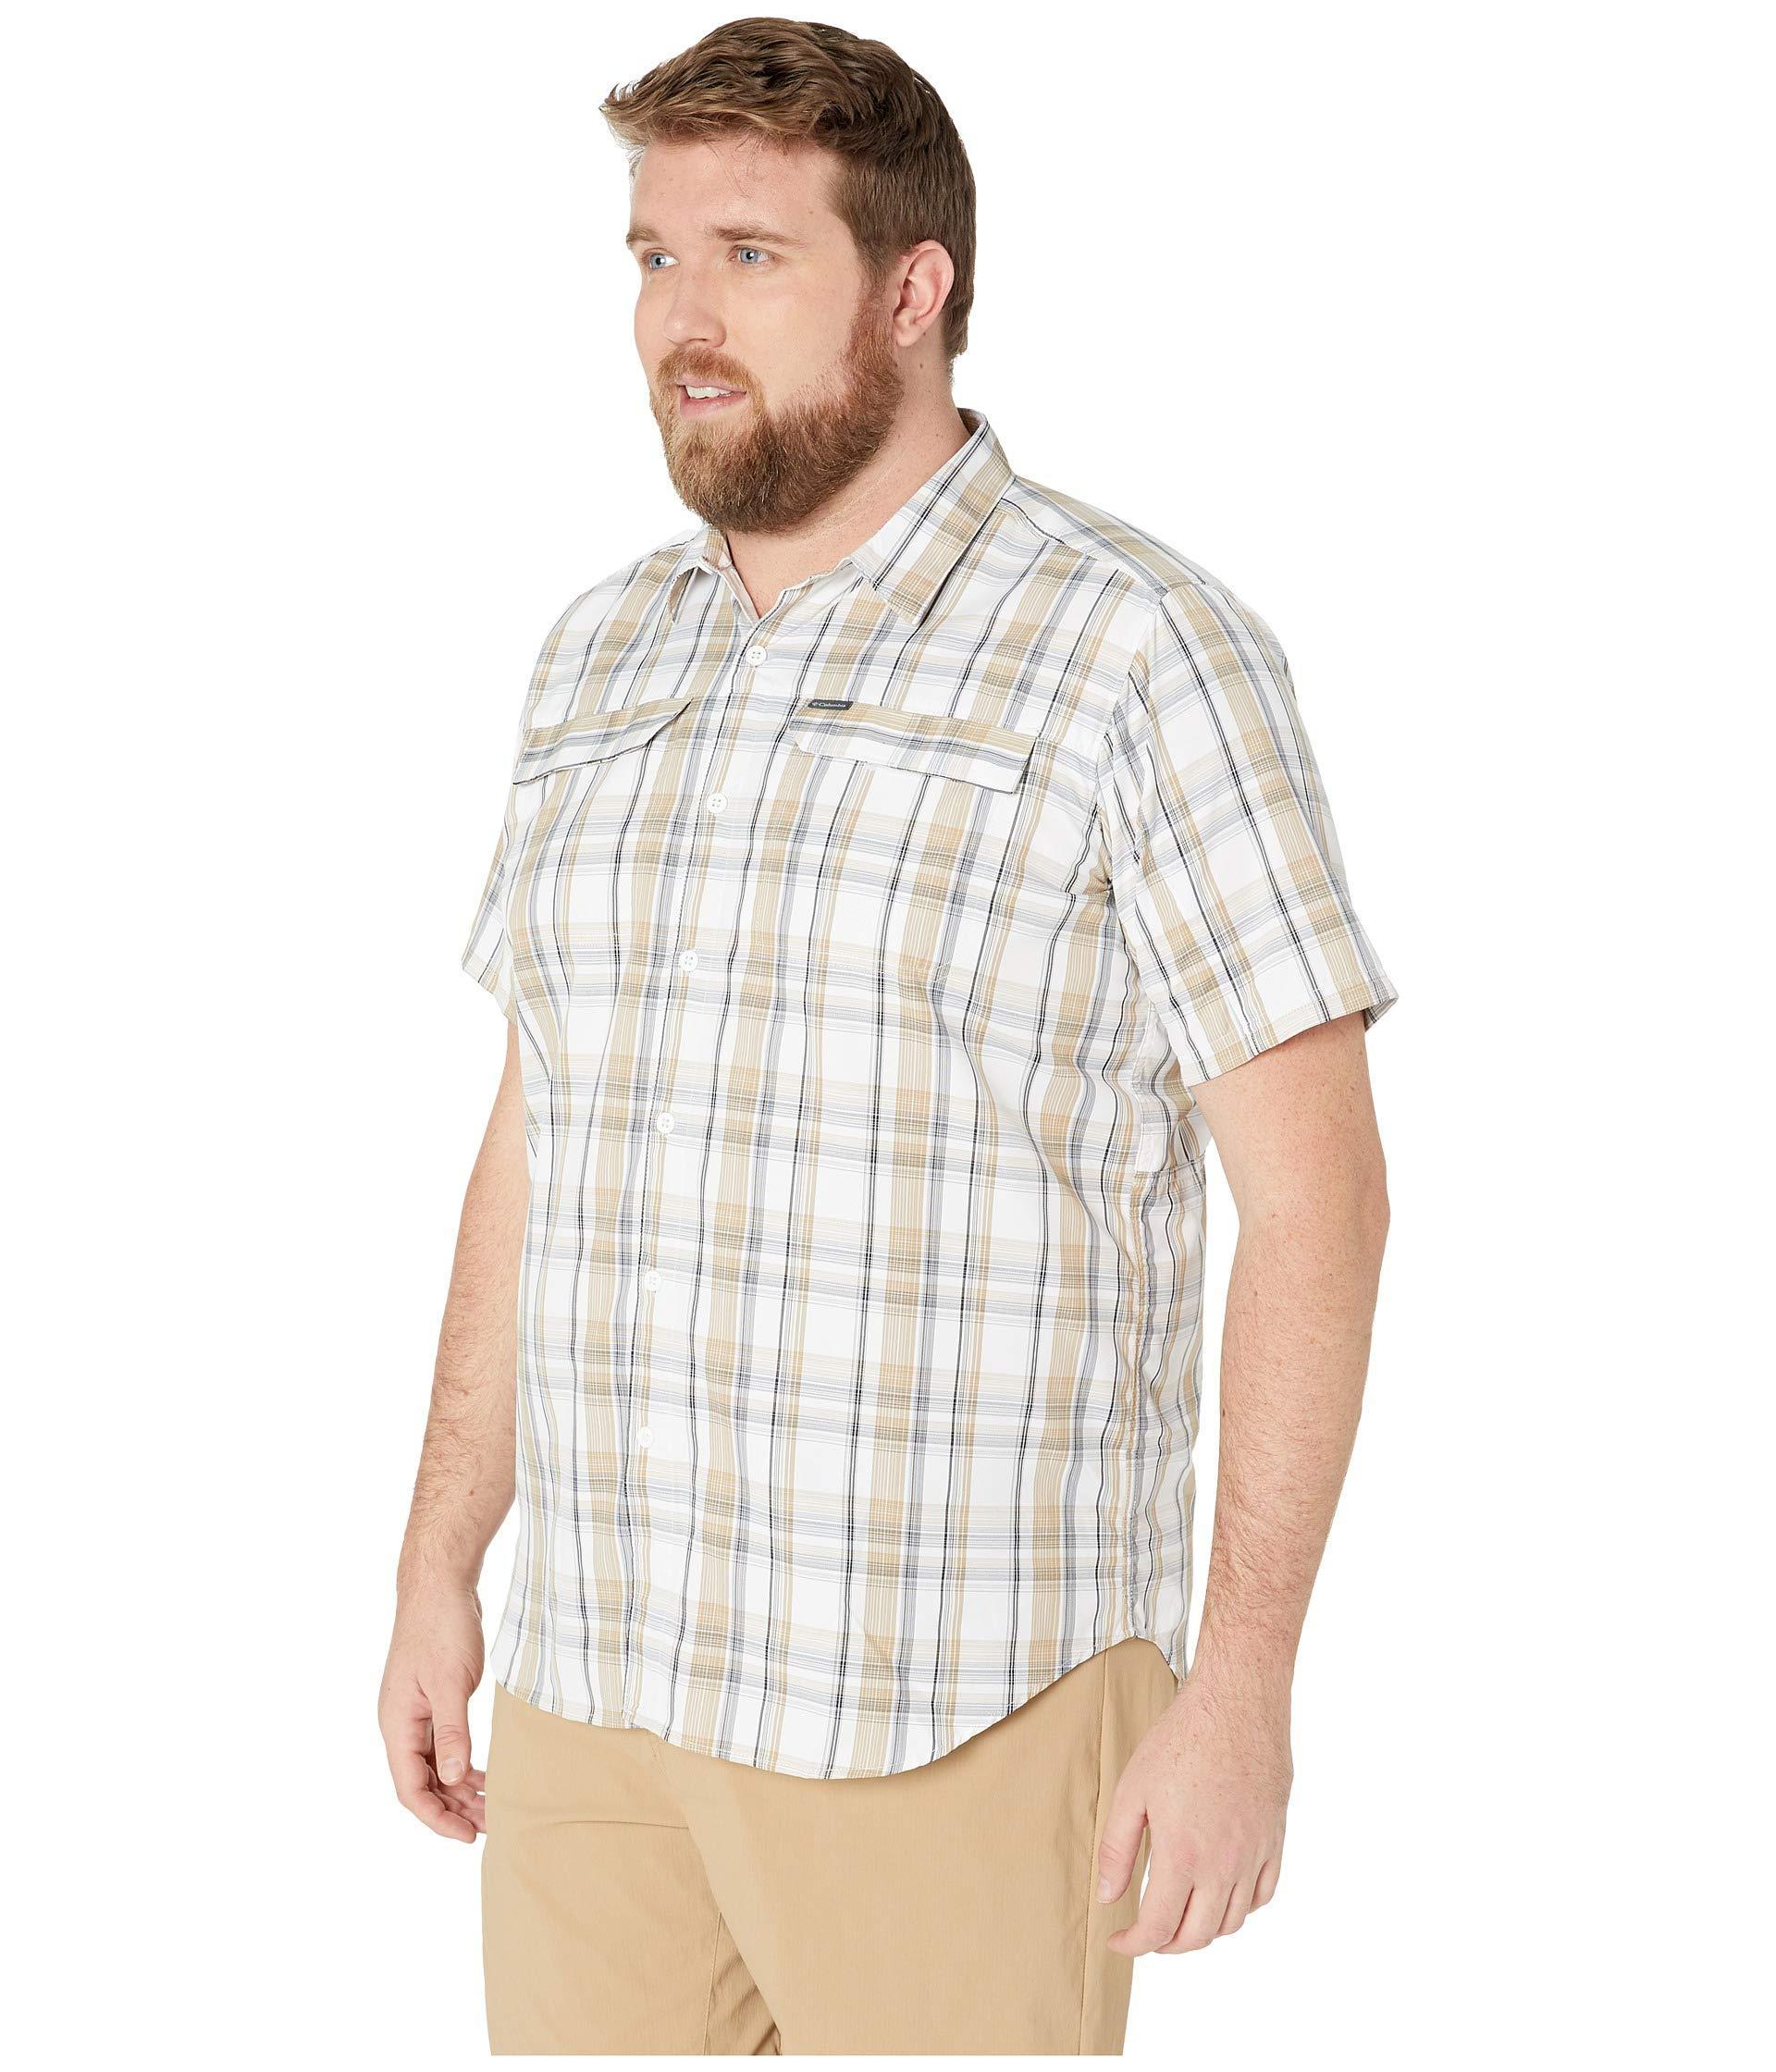 e9dbf8131f4 Lyst - Columbia Big And Tall Silver Ridge 2.0 Multi Plaid Short Sleeve Shirt  (beach Plaid) Men's Short Sleeve Button Up for Men